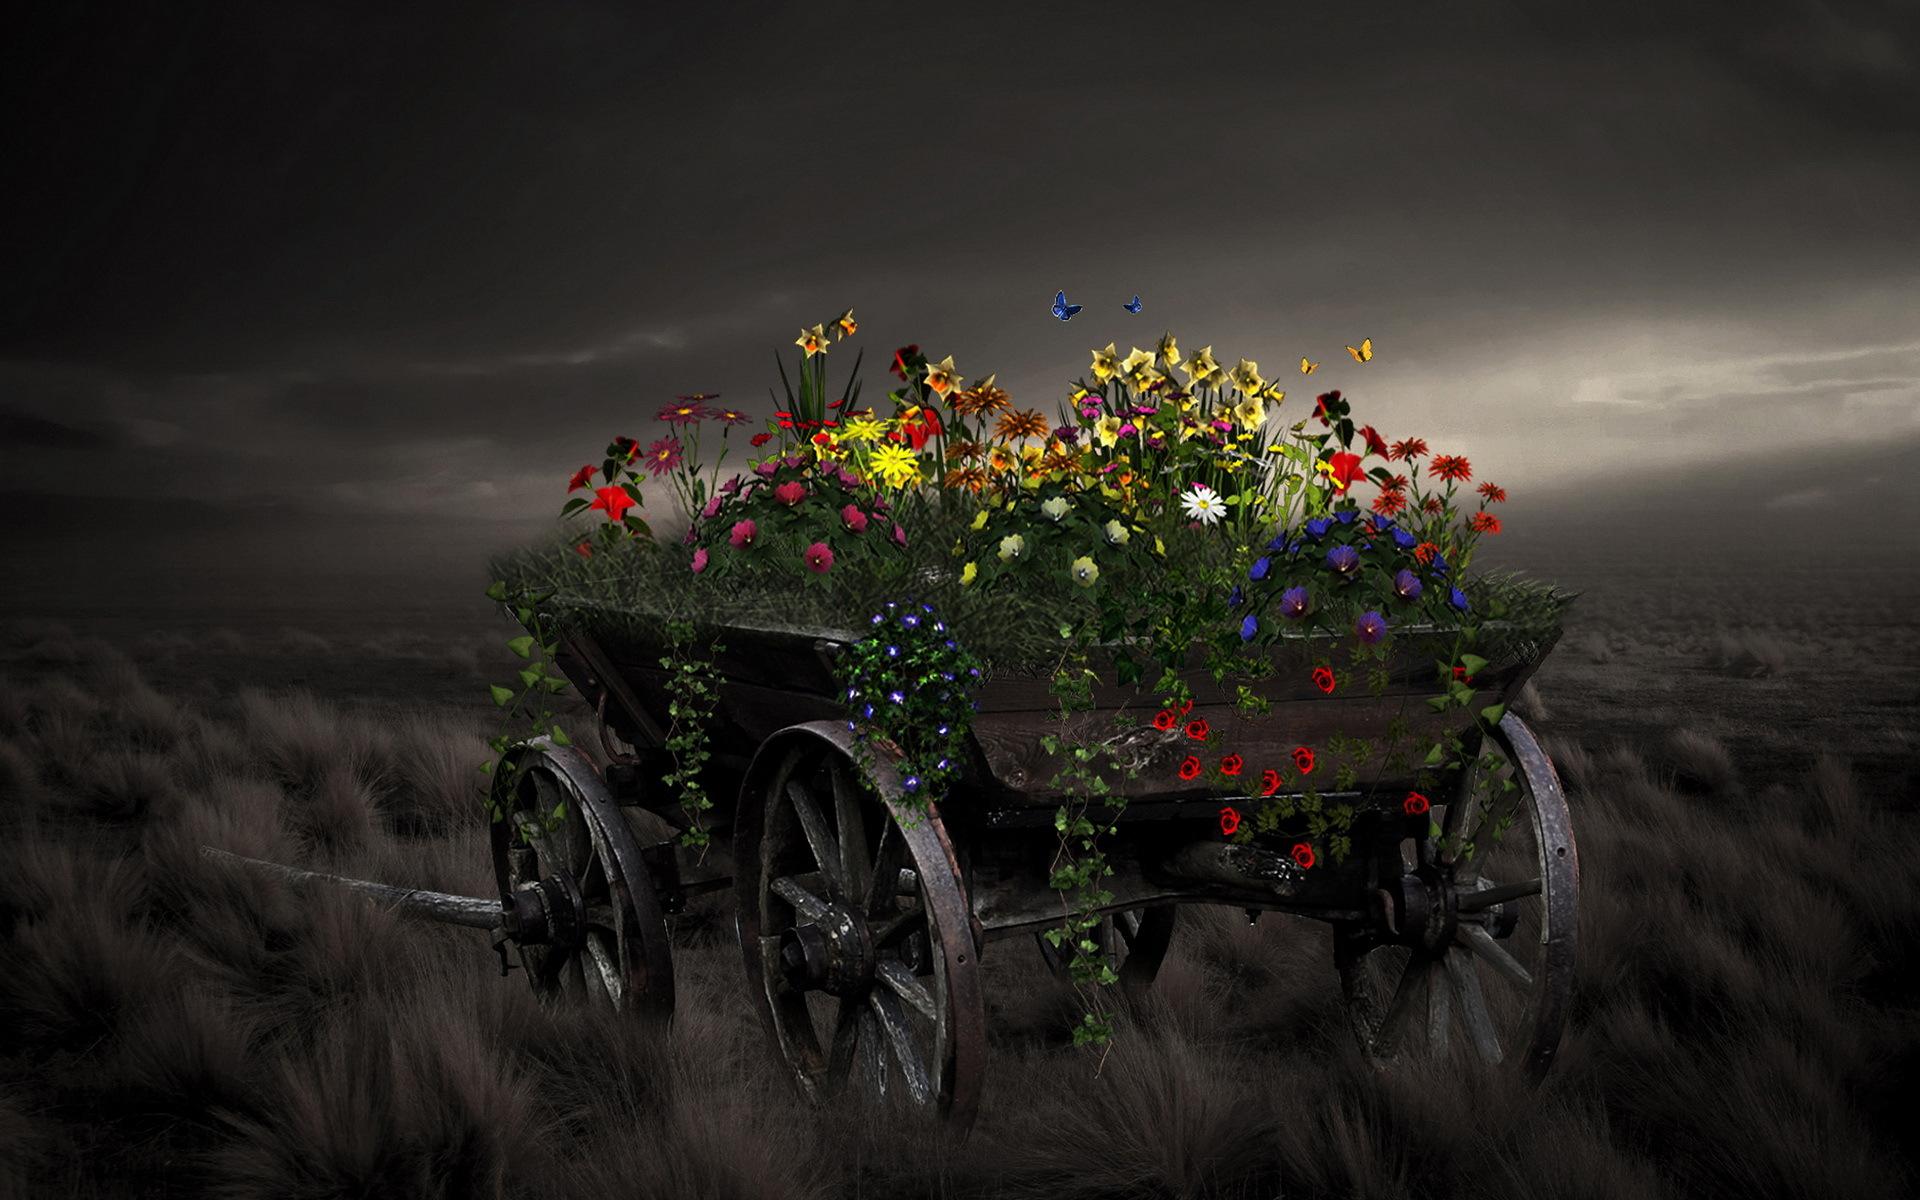 Art Artistic Matte Paintings Nature Flowers Landscapes Vehicles Wagon Wheels Dark Fields Grass Sky Clouds Moon Light Fantasy Plants Color Wallpaper